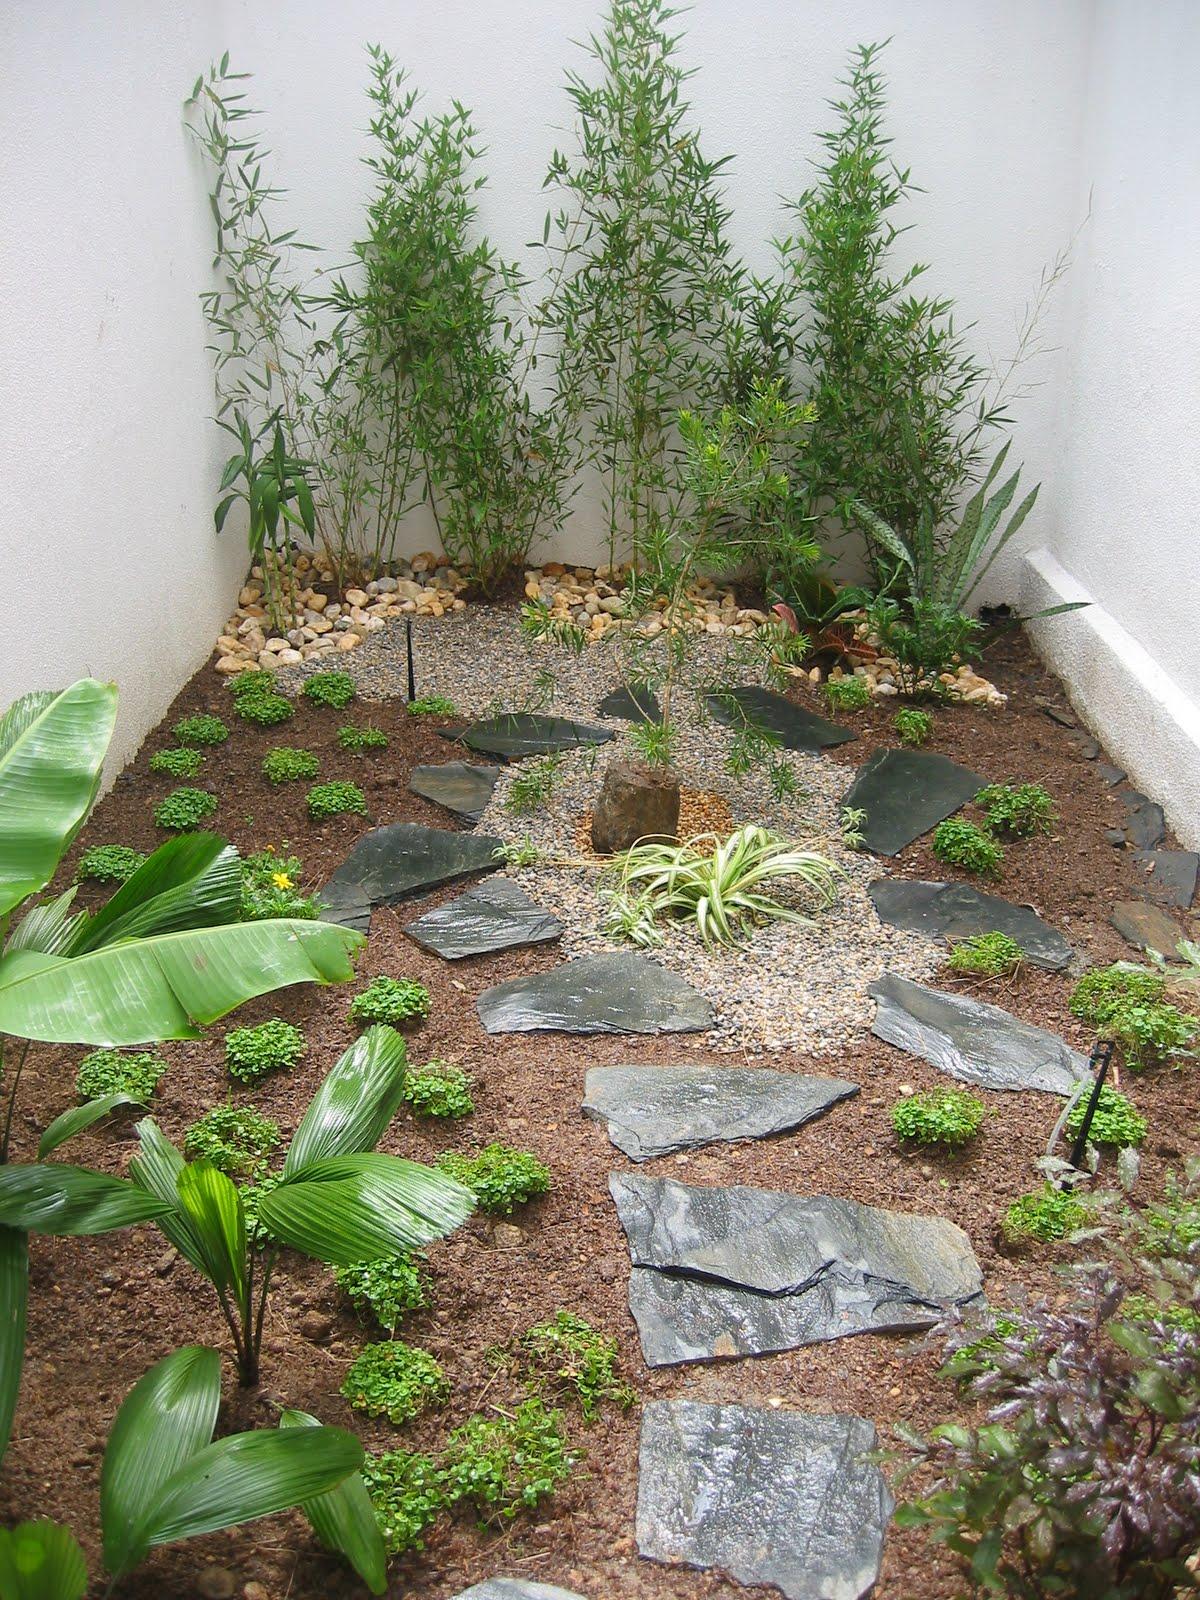 La tiendita del bonsai y paisajismo jardines bonsai paisajismo - Jardines y paisajismo ...